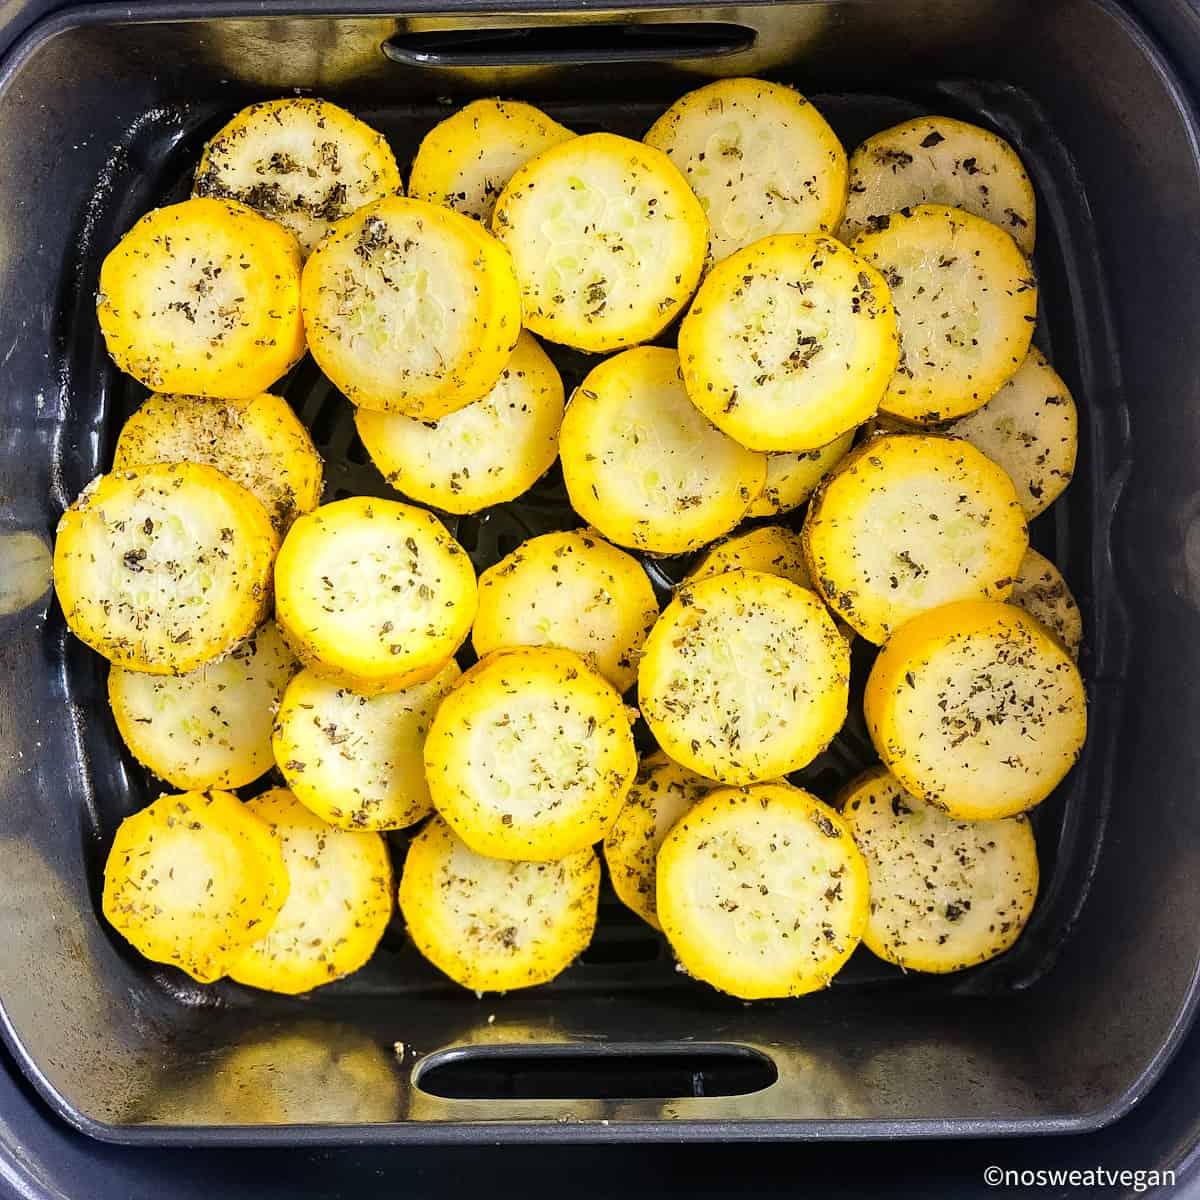 Yellow squash in air fryer basket.